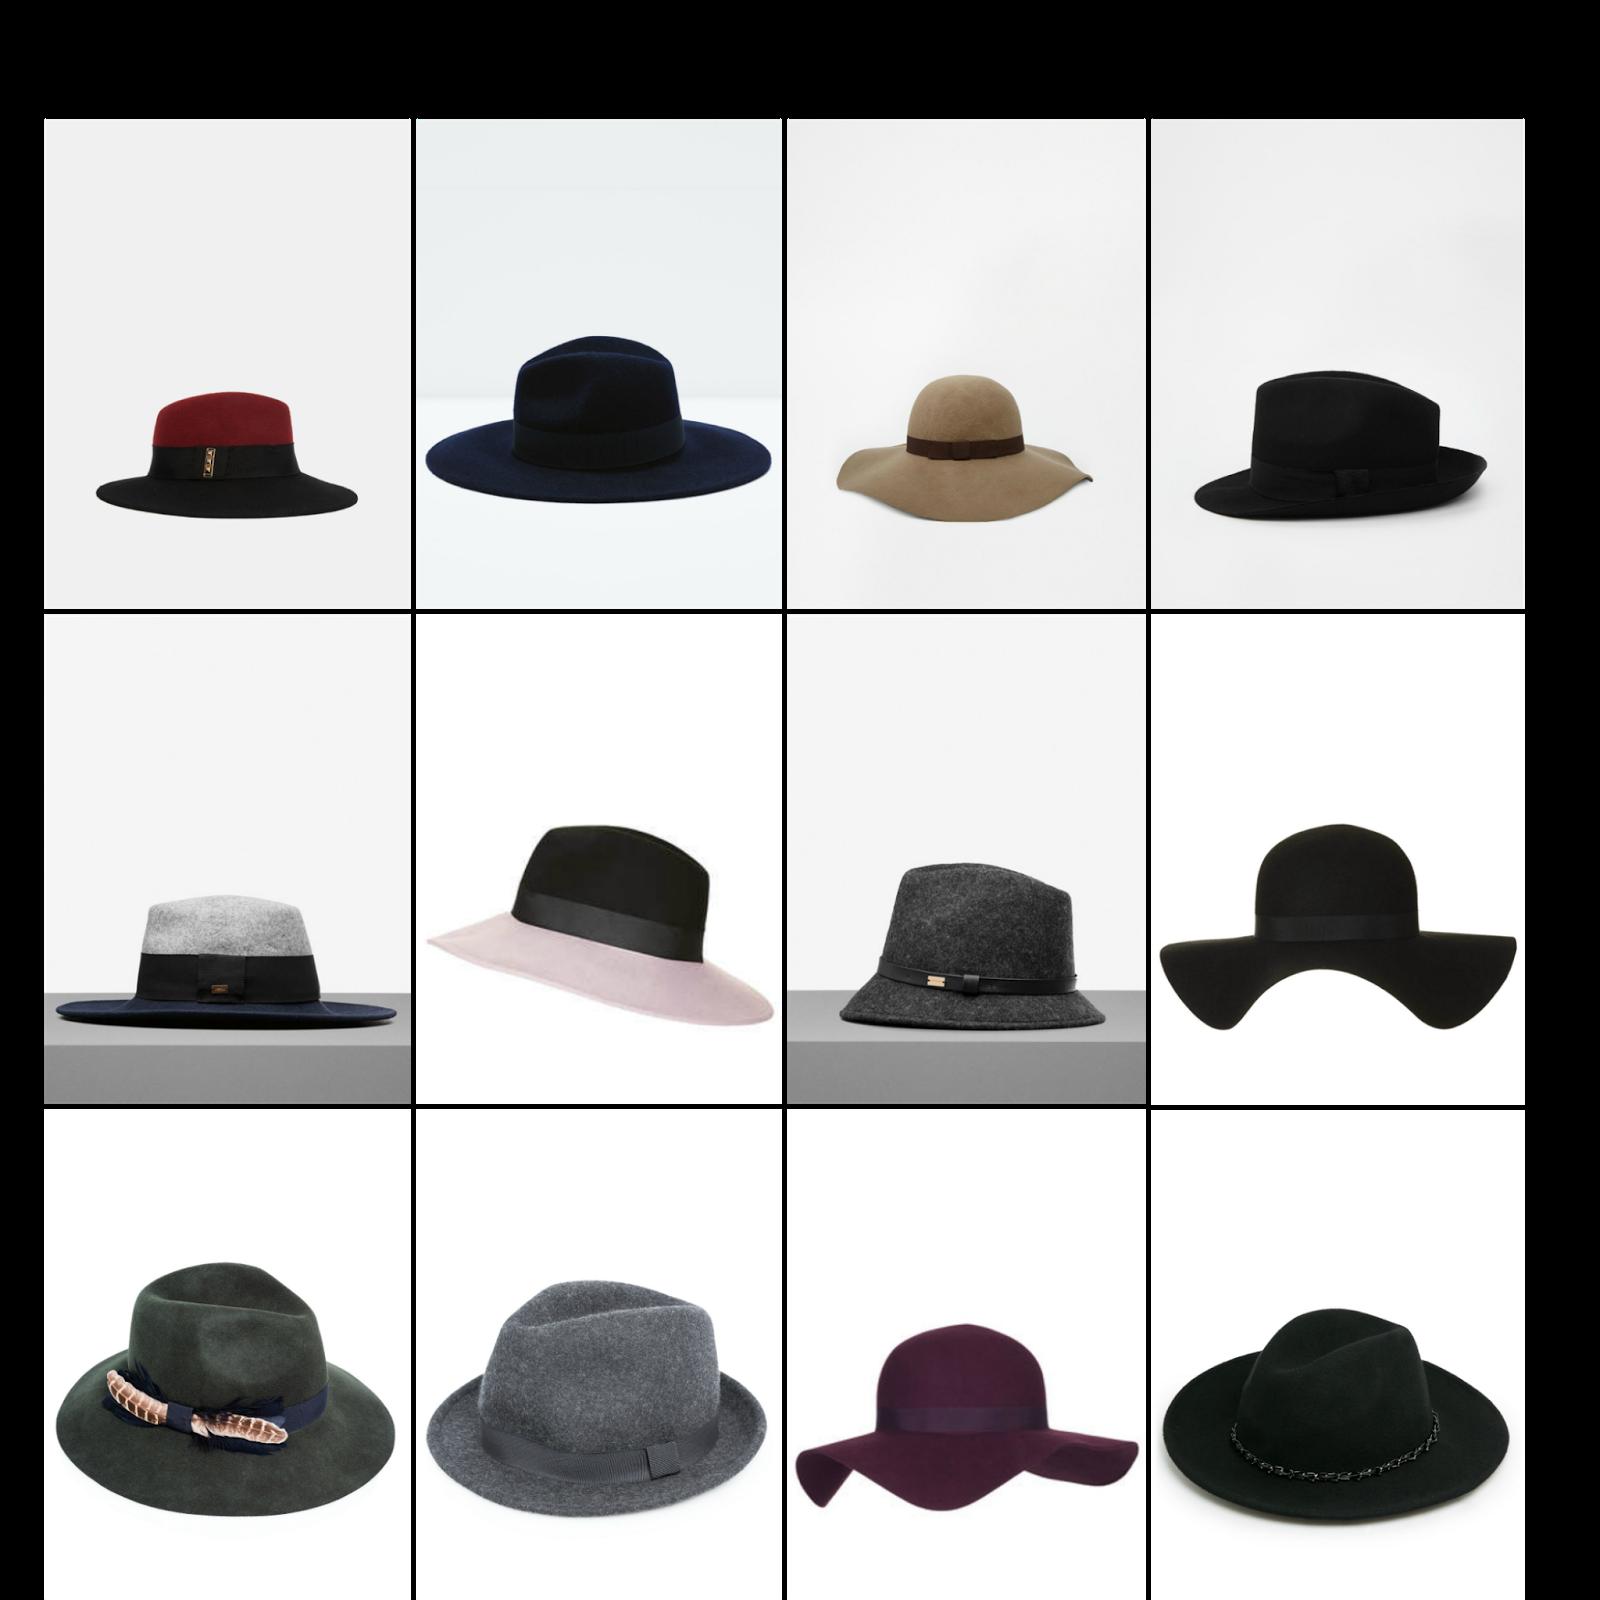 Trucos para elegir sombrero